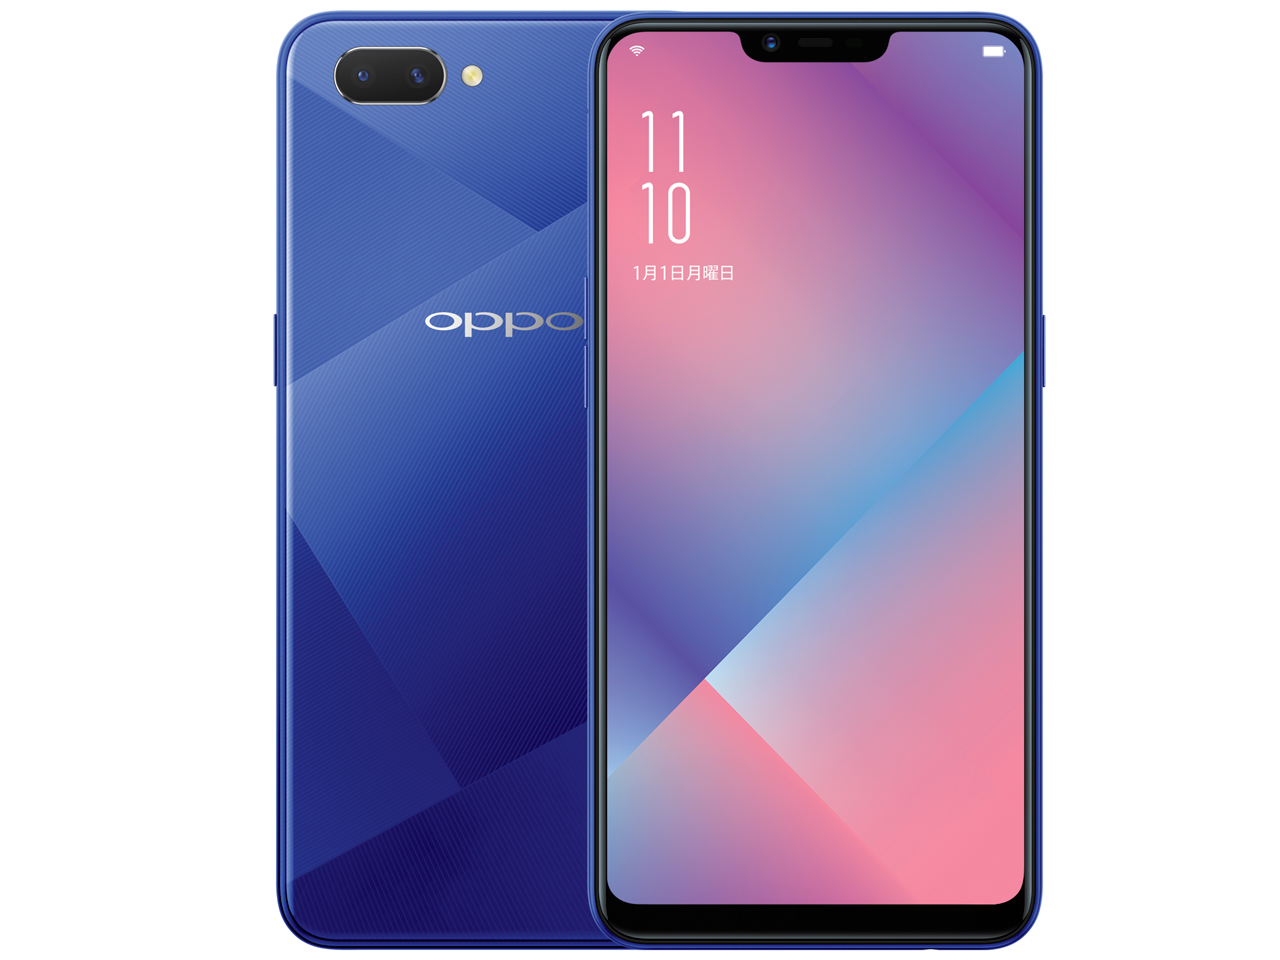 OPPO R15 Neo 4GBメモリー SIMフリー [ダイヤモンドブルー] 2018年夏モデル JAN:4580038873419